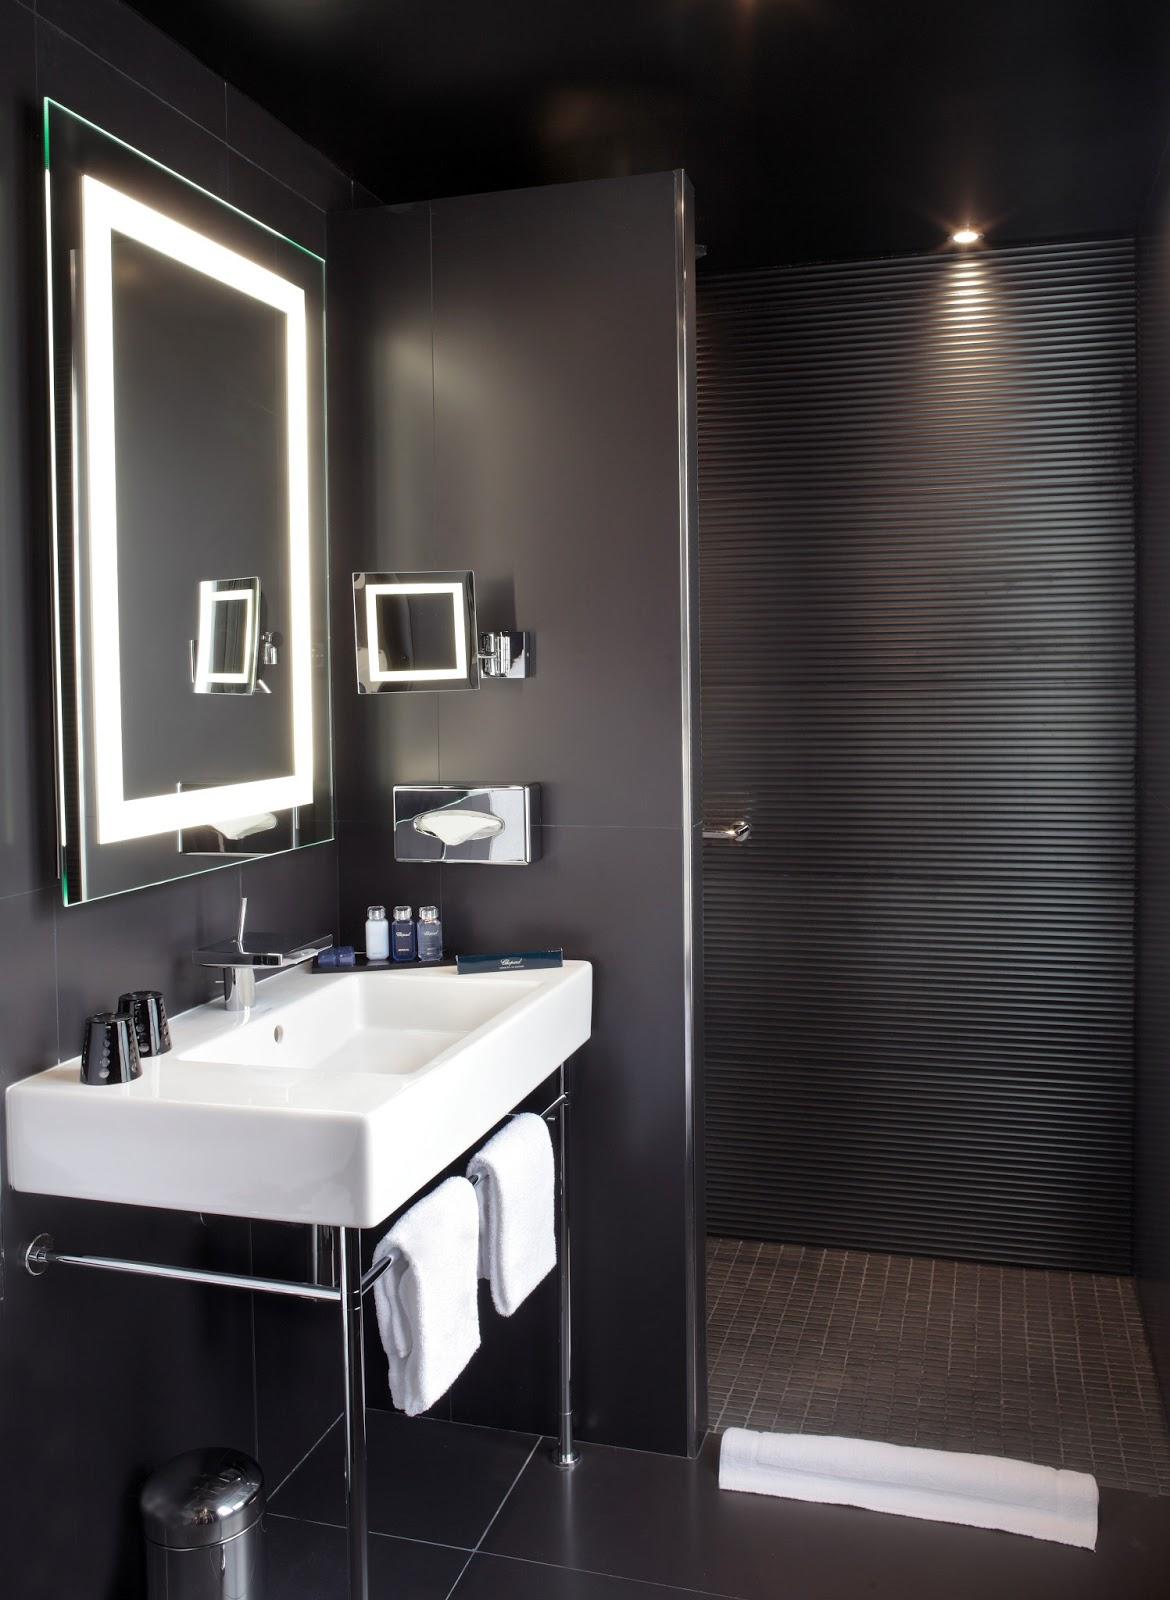 work inn progress le best western premier op ra diamond s agrand t. Black Bedroom Furniture Sets. Home Design Ideas